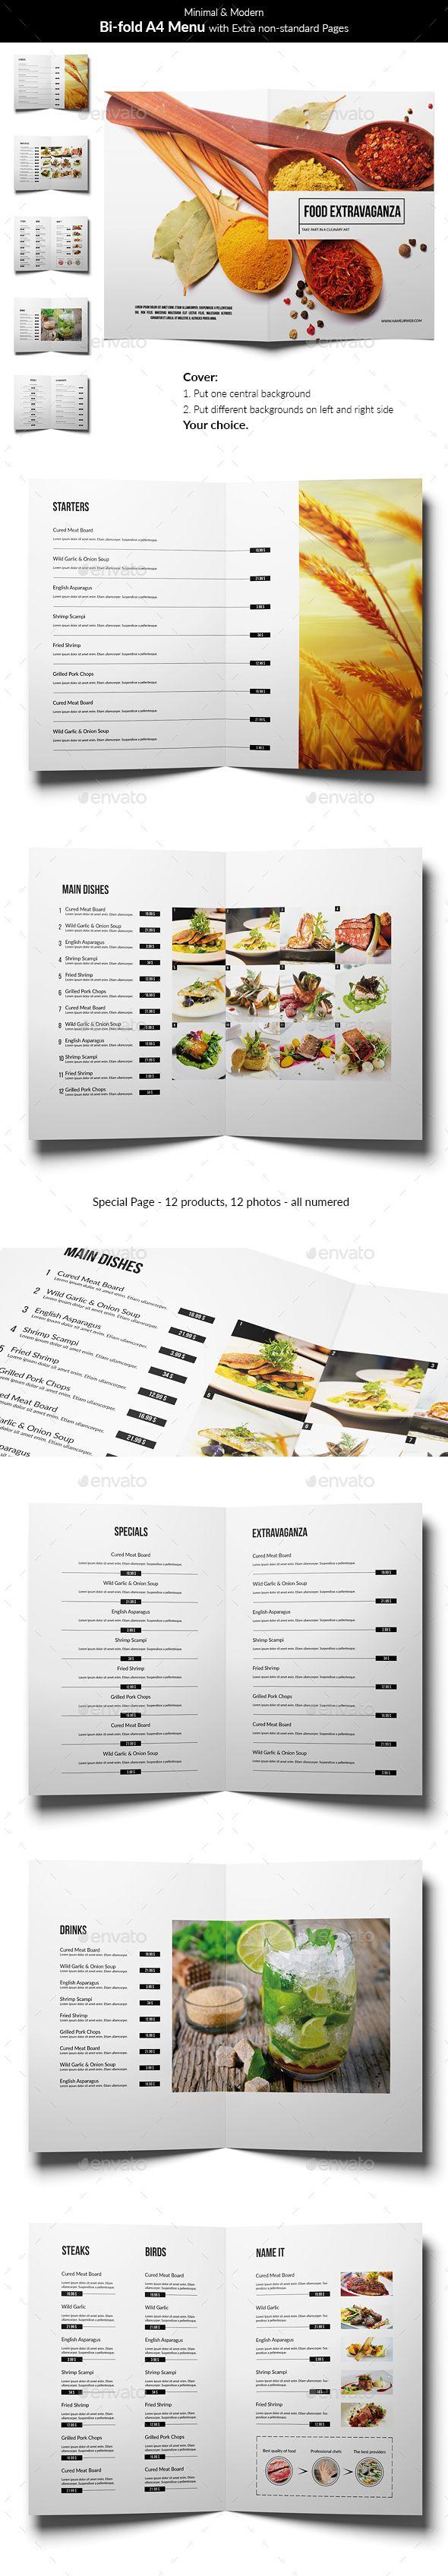 Minimal and Modern Food Menu Template PSD #design Download: http://graphicriver.net/item/minimal-and-modern-food-menu/14322185?ref=ksioks